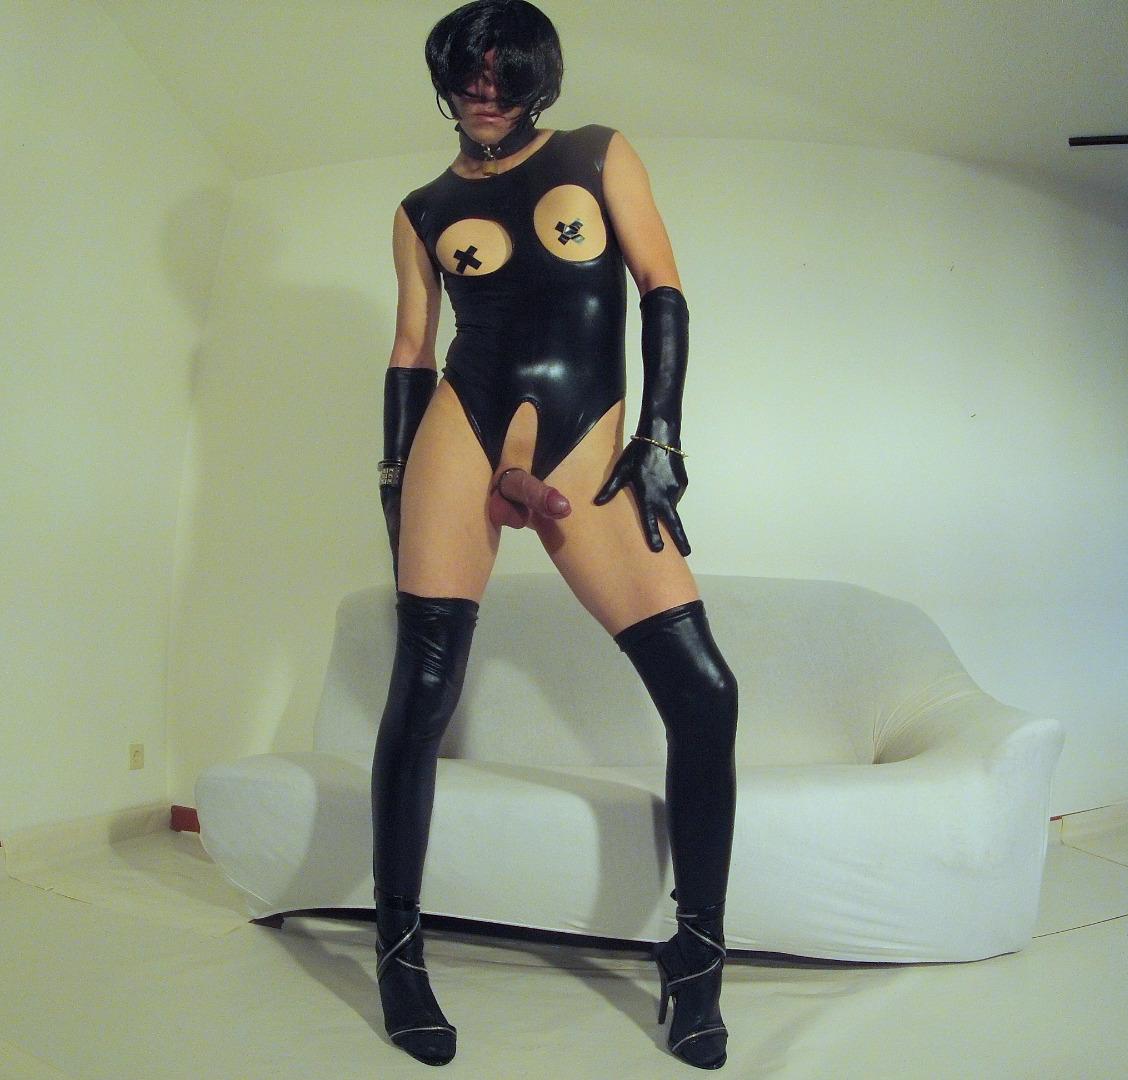 kitty caprice satisfies her cock craving bangbros online